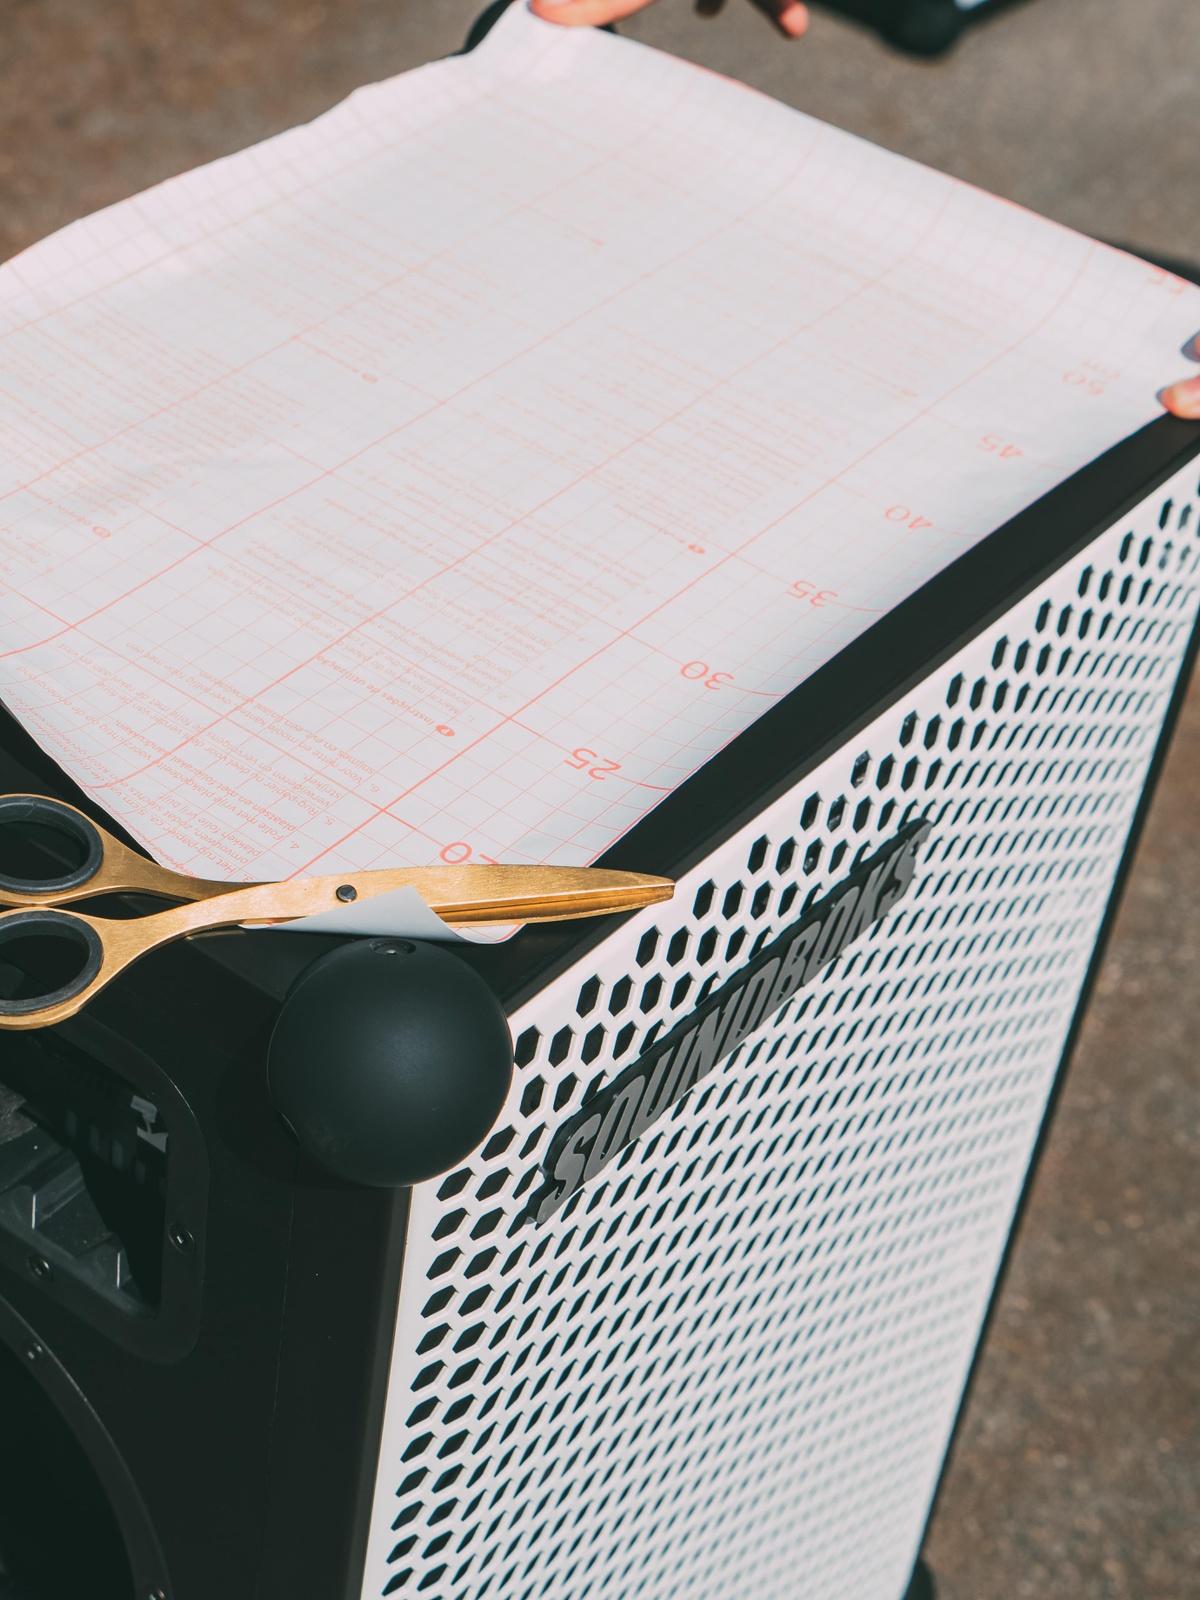 customizing the SOUNDBOKS with white foil